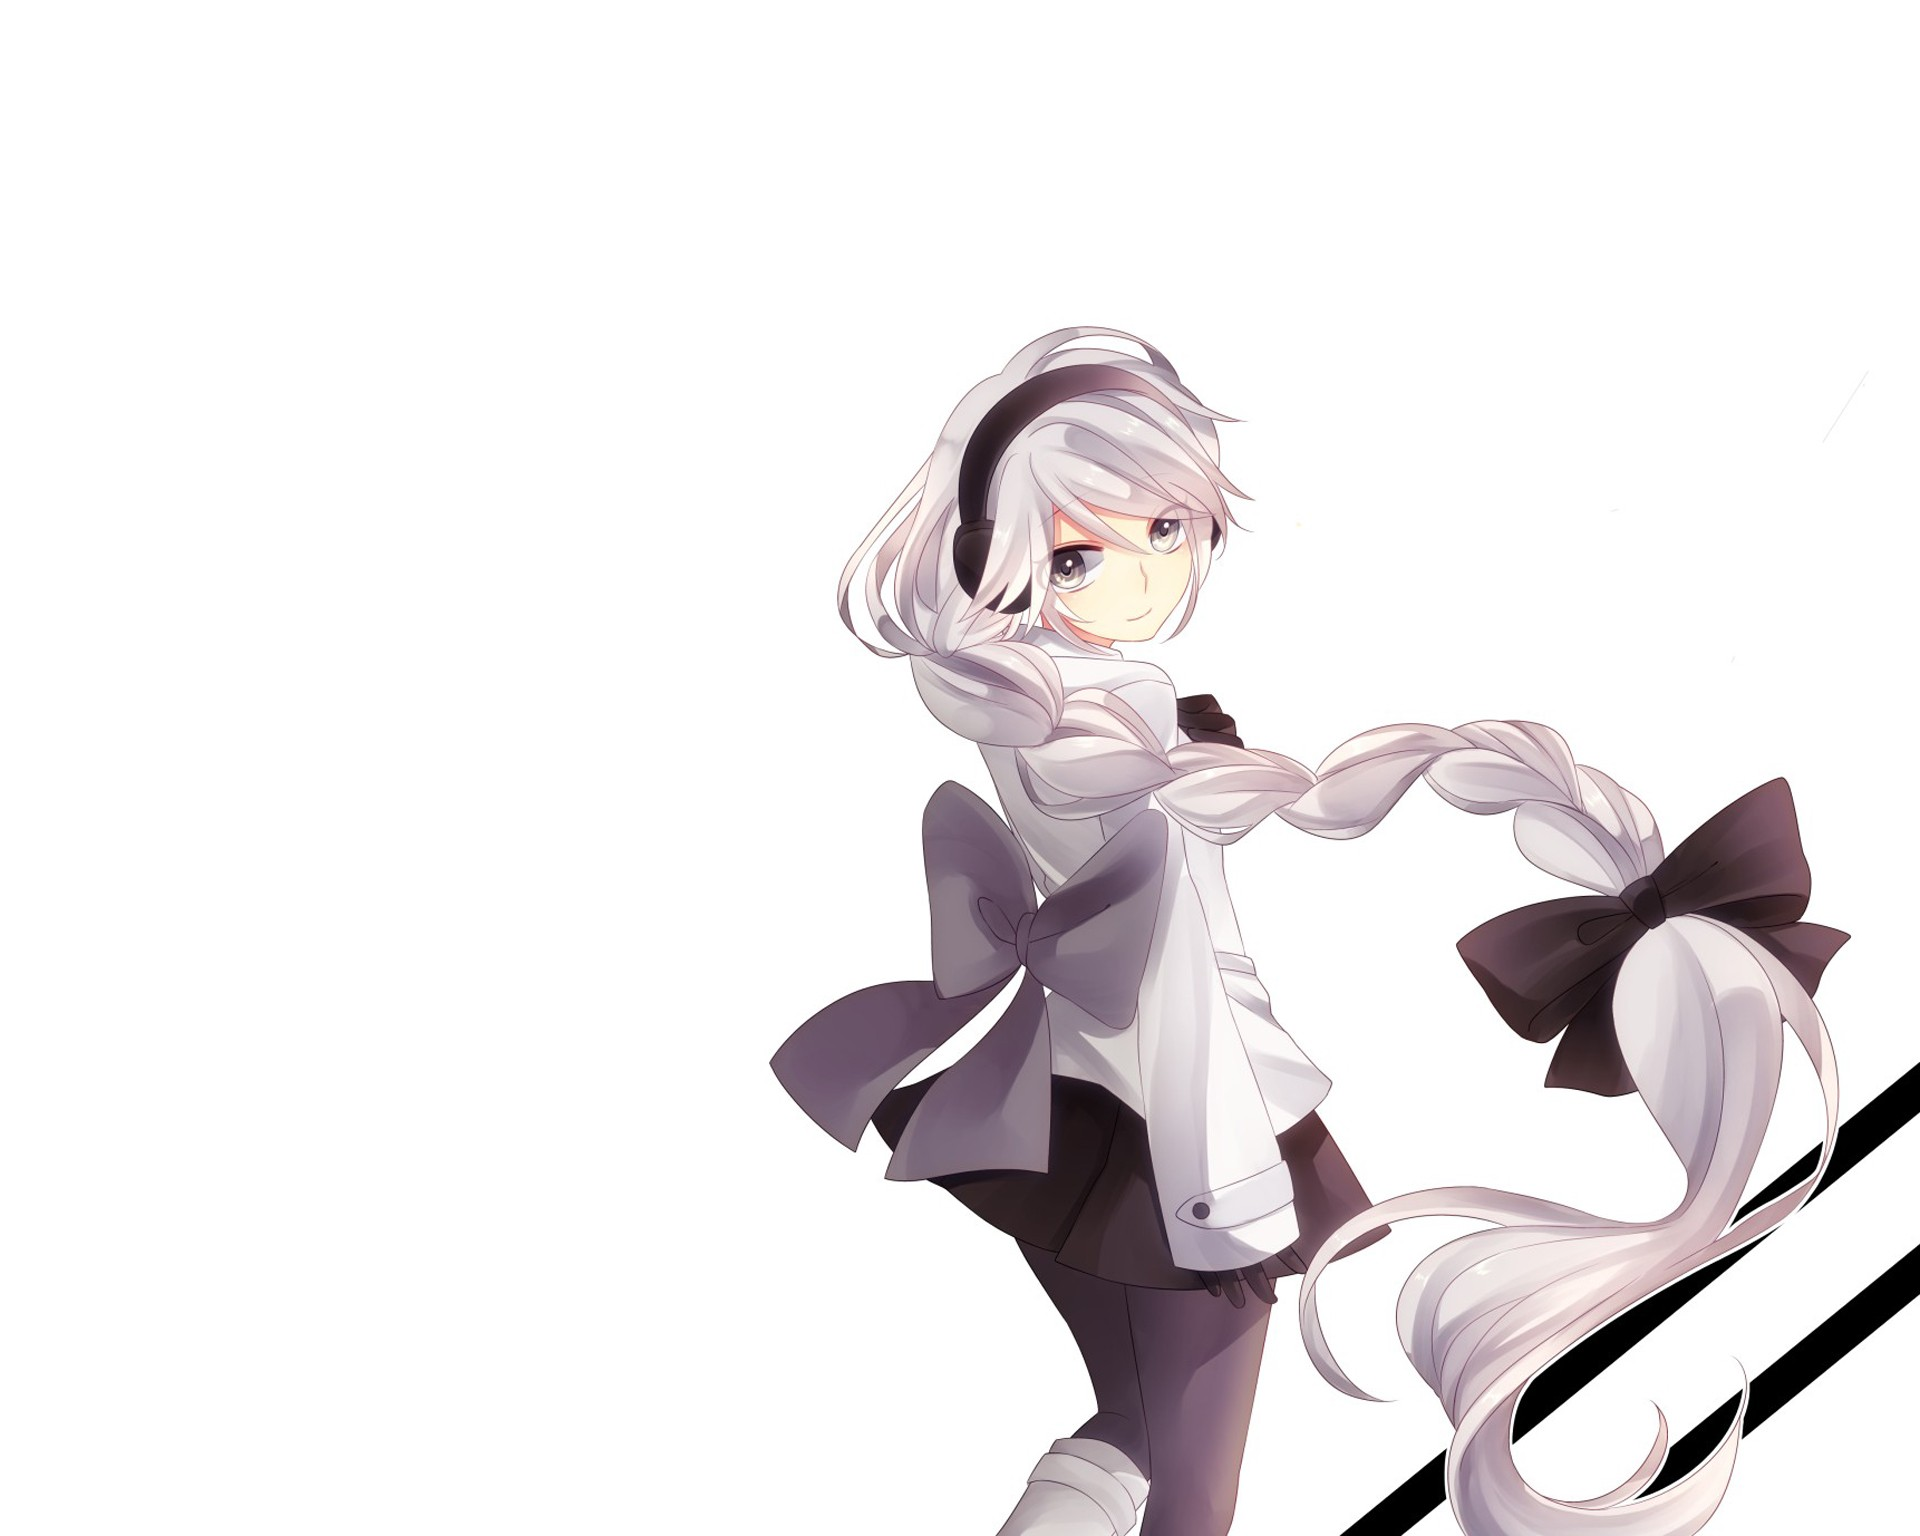 аниме картинки белый фон: